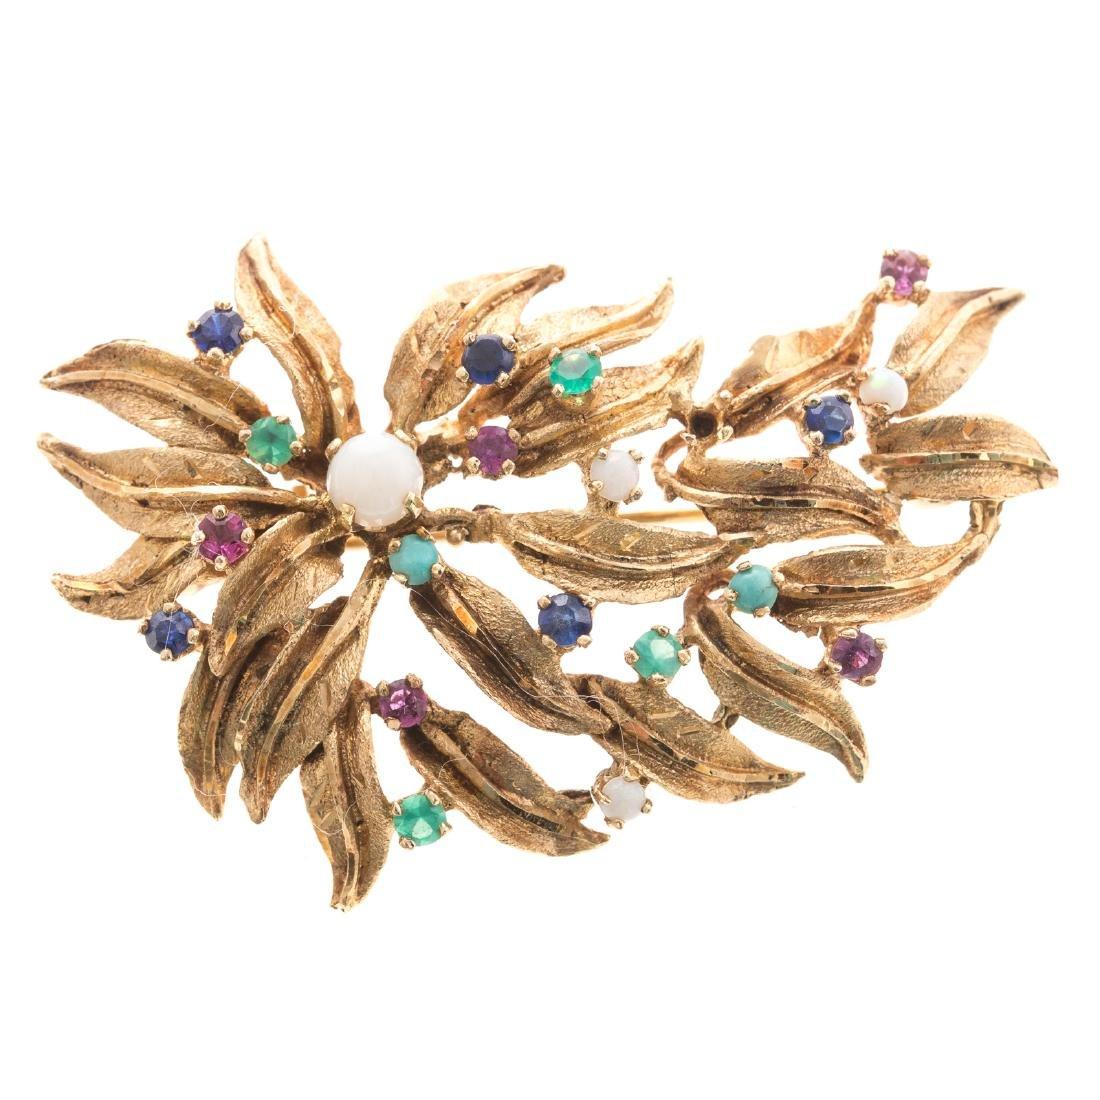 A Lady's Gemstone Brooch in 14K Gold - 2